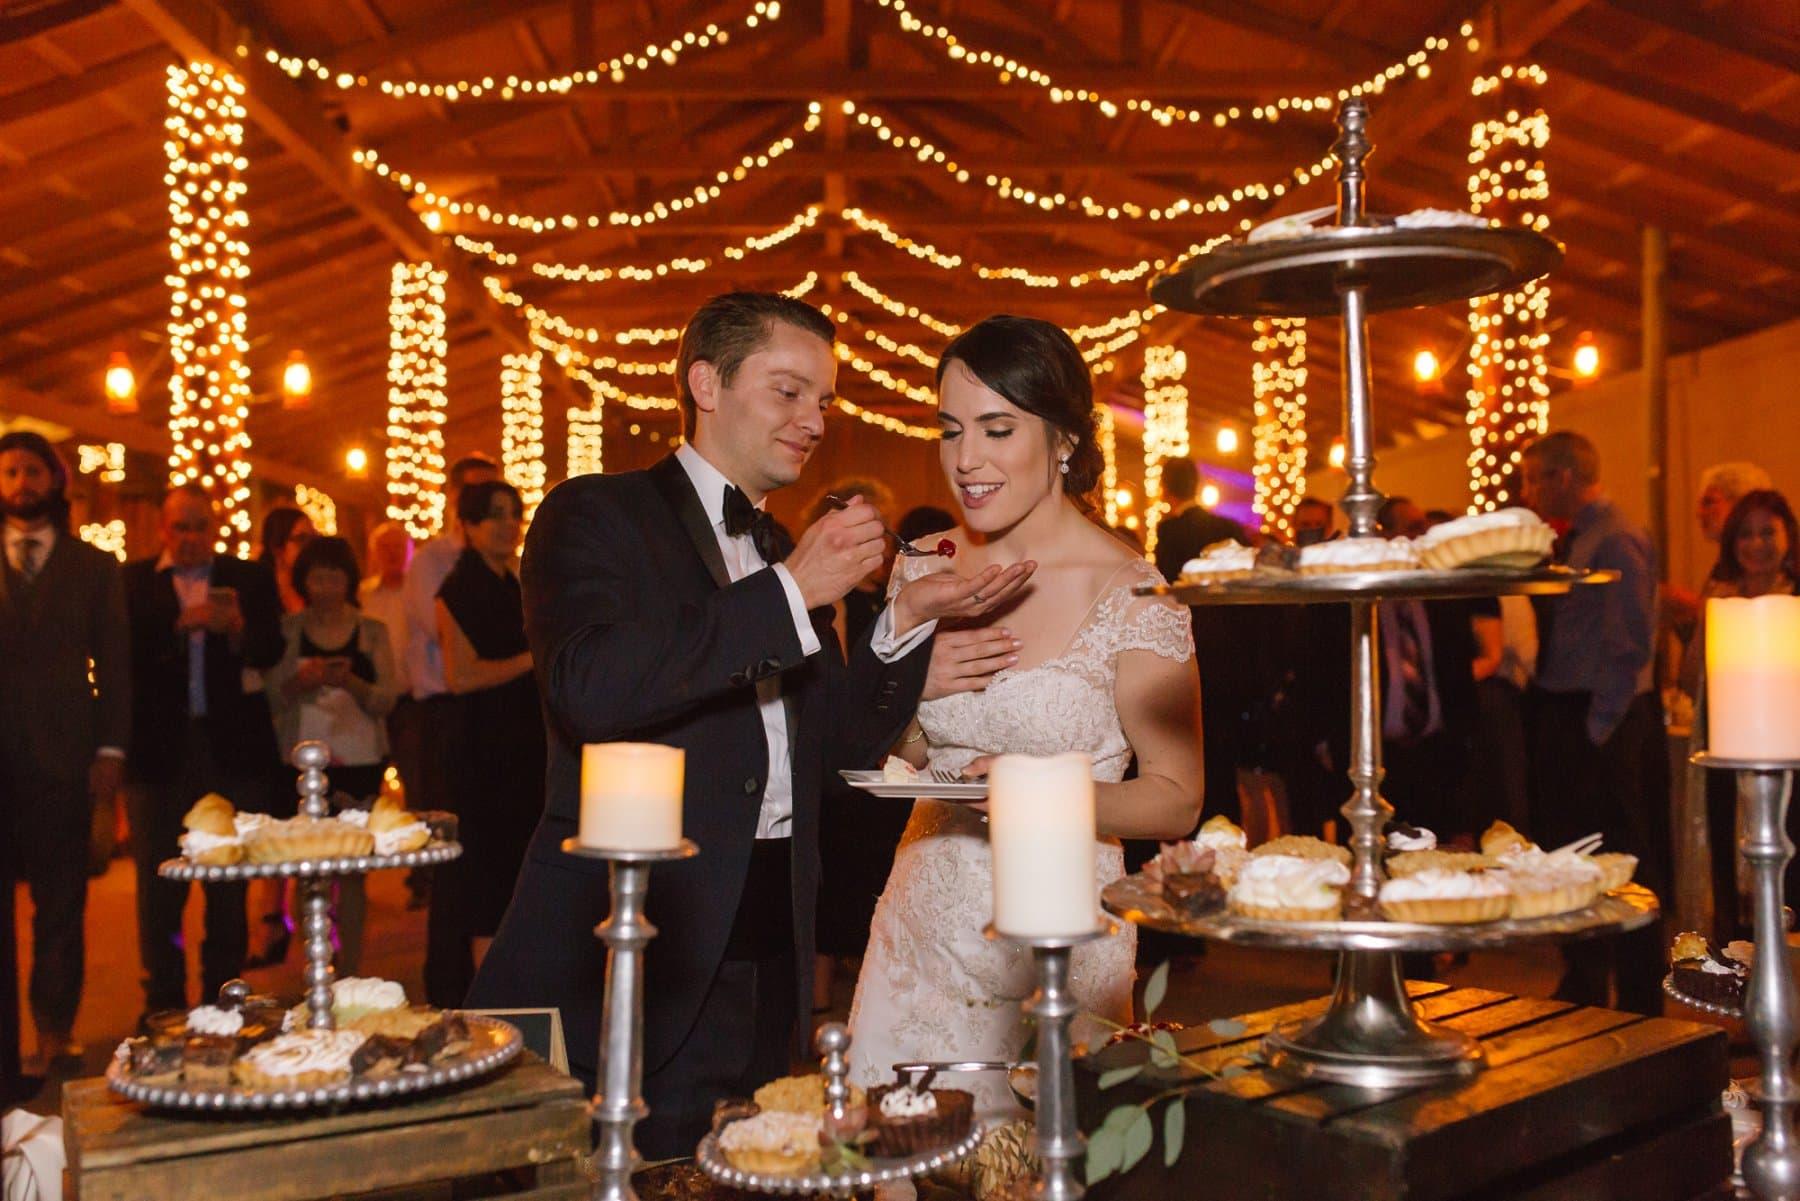 cutting wedding pie at Desert Foothills barn wedding venue